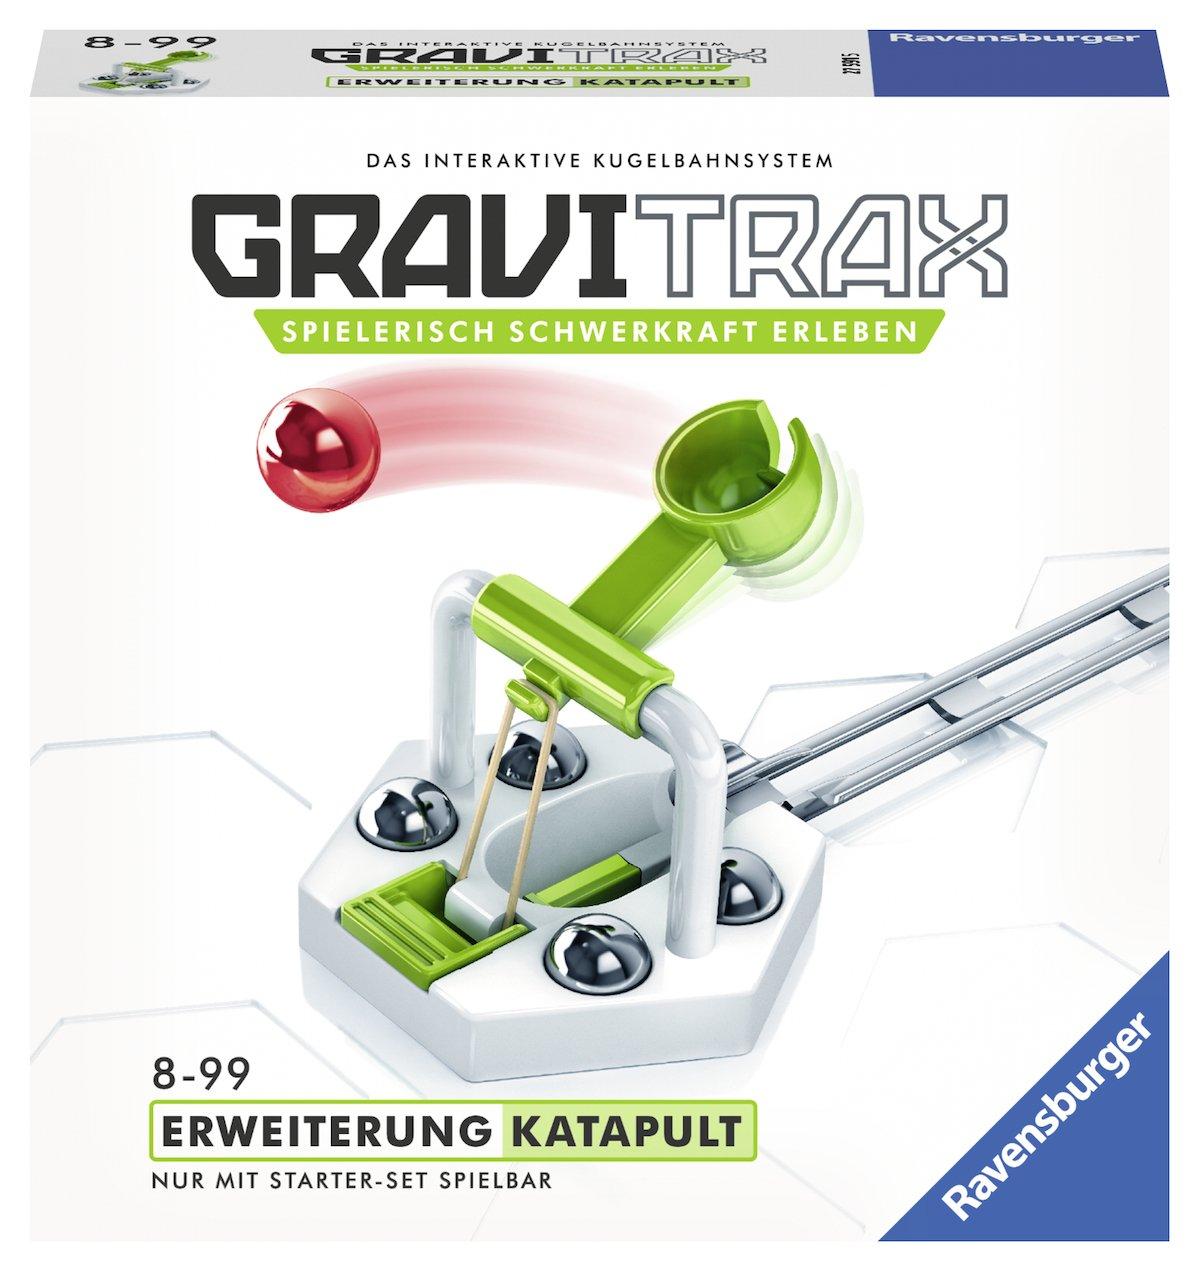 GraviTrax Ravensburger 27591 Katapult Konstruktionsspielzeug Ravensburger Spielverlag